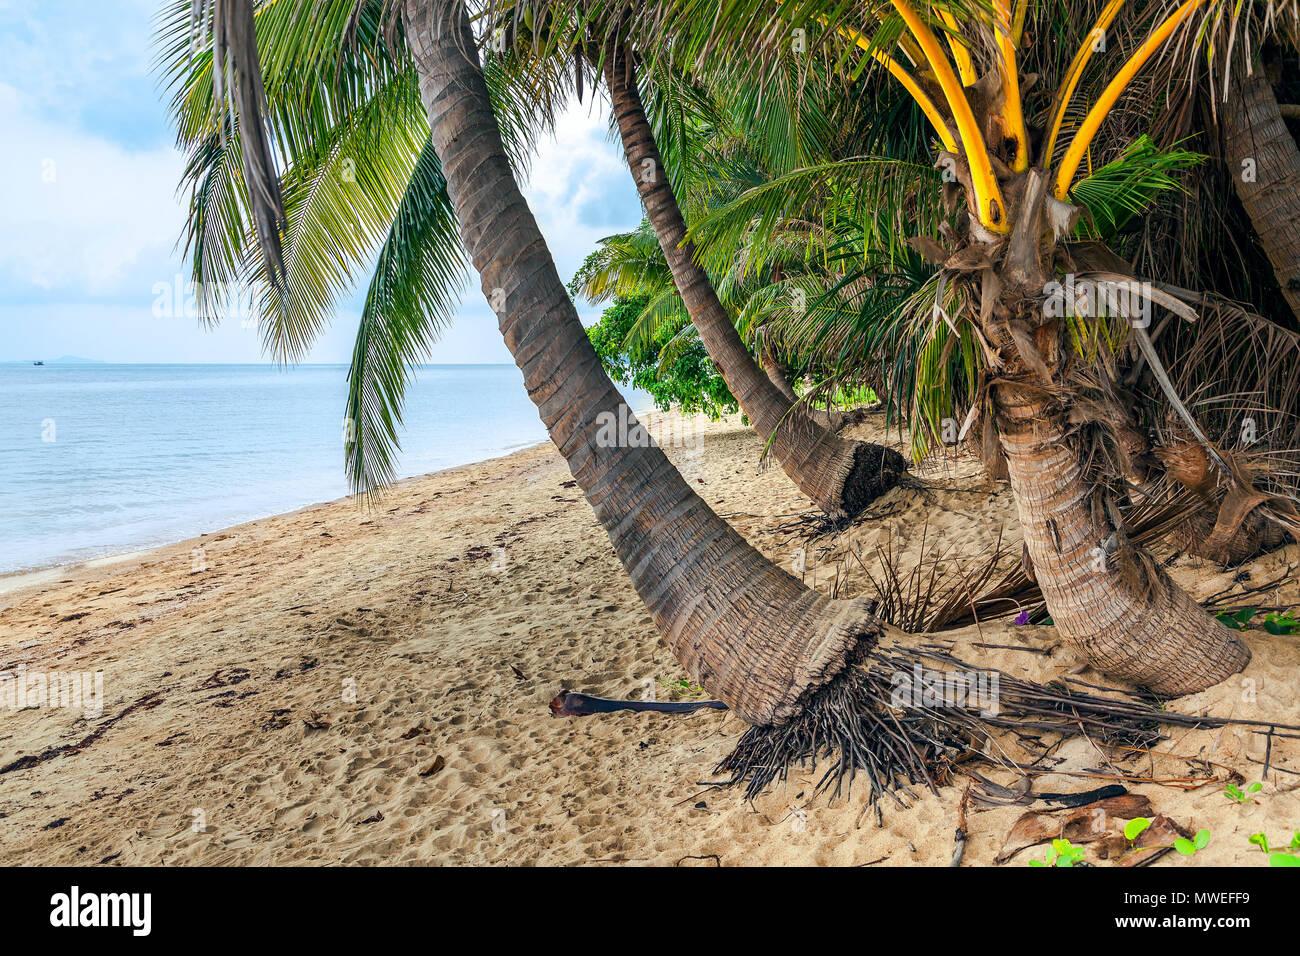 Coconut île de Koh Samui en Thaïlande. Photo Stock